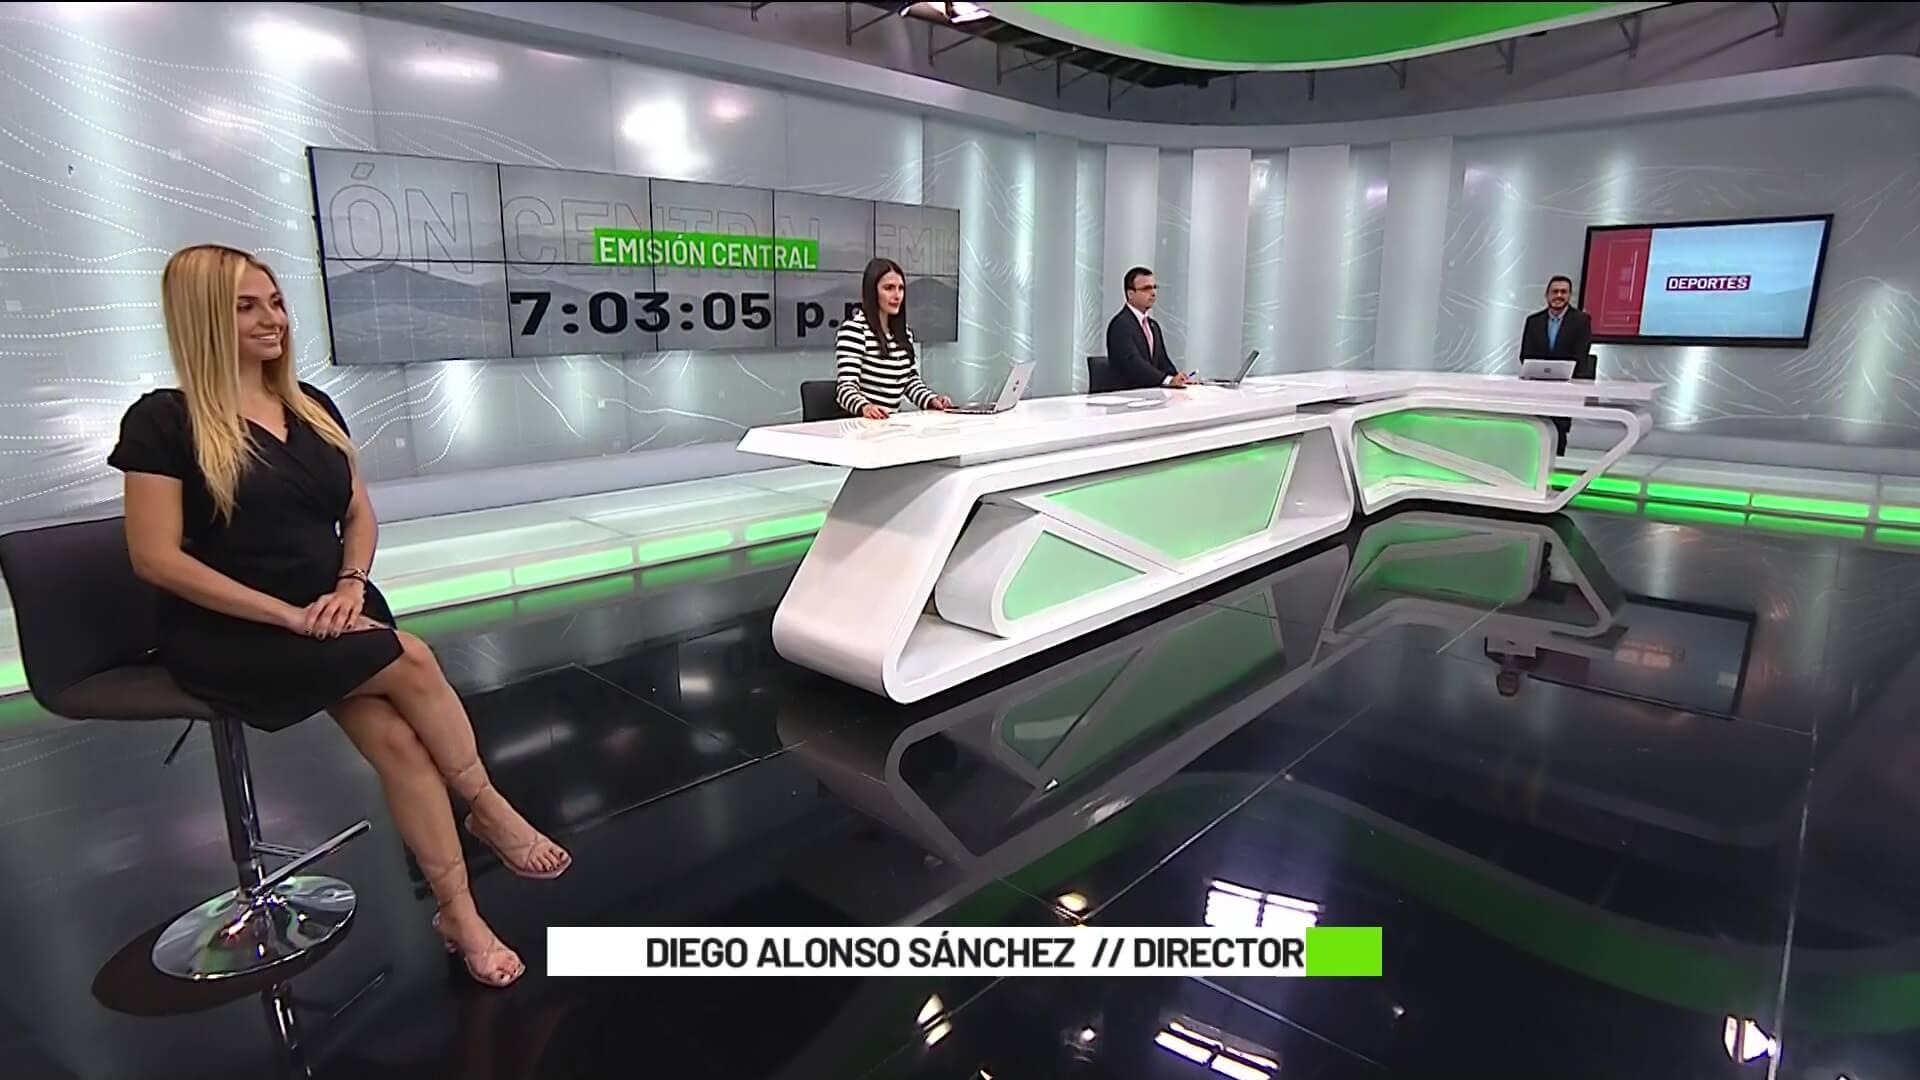 Teleantioquia Noticias - miércoles 14 de julio de 2021